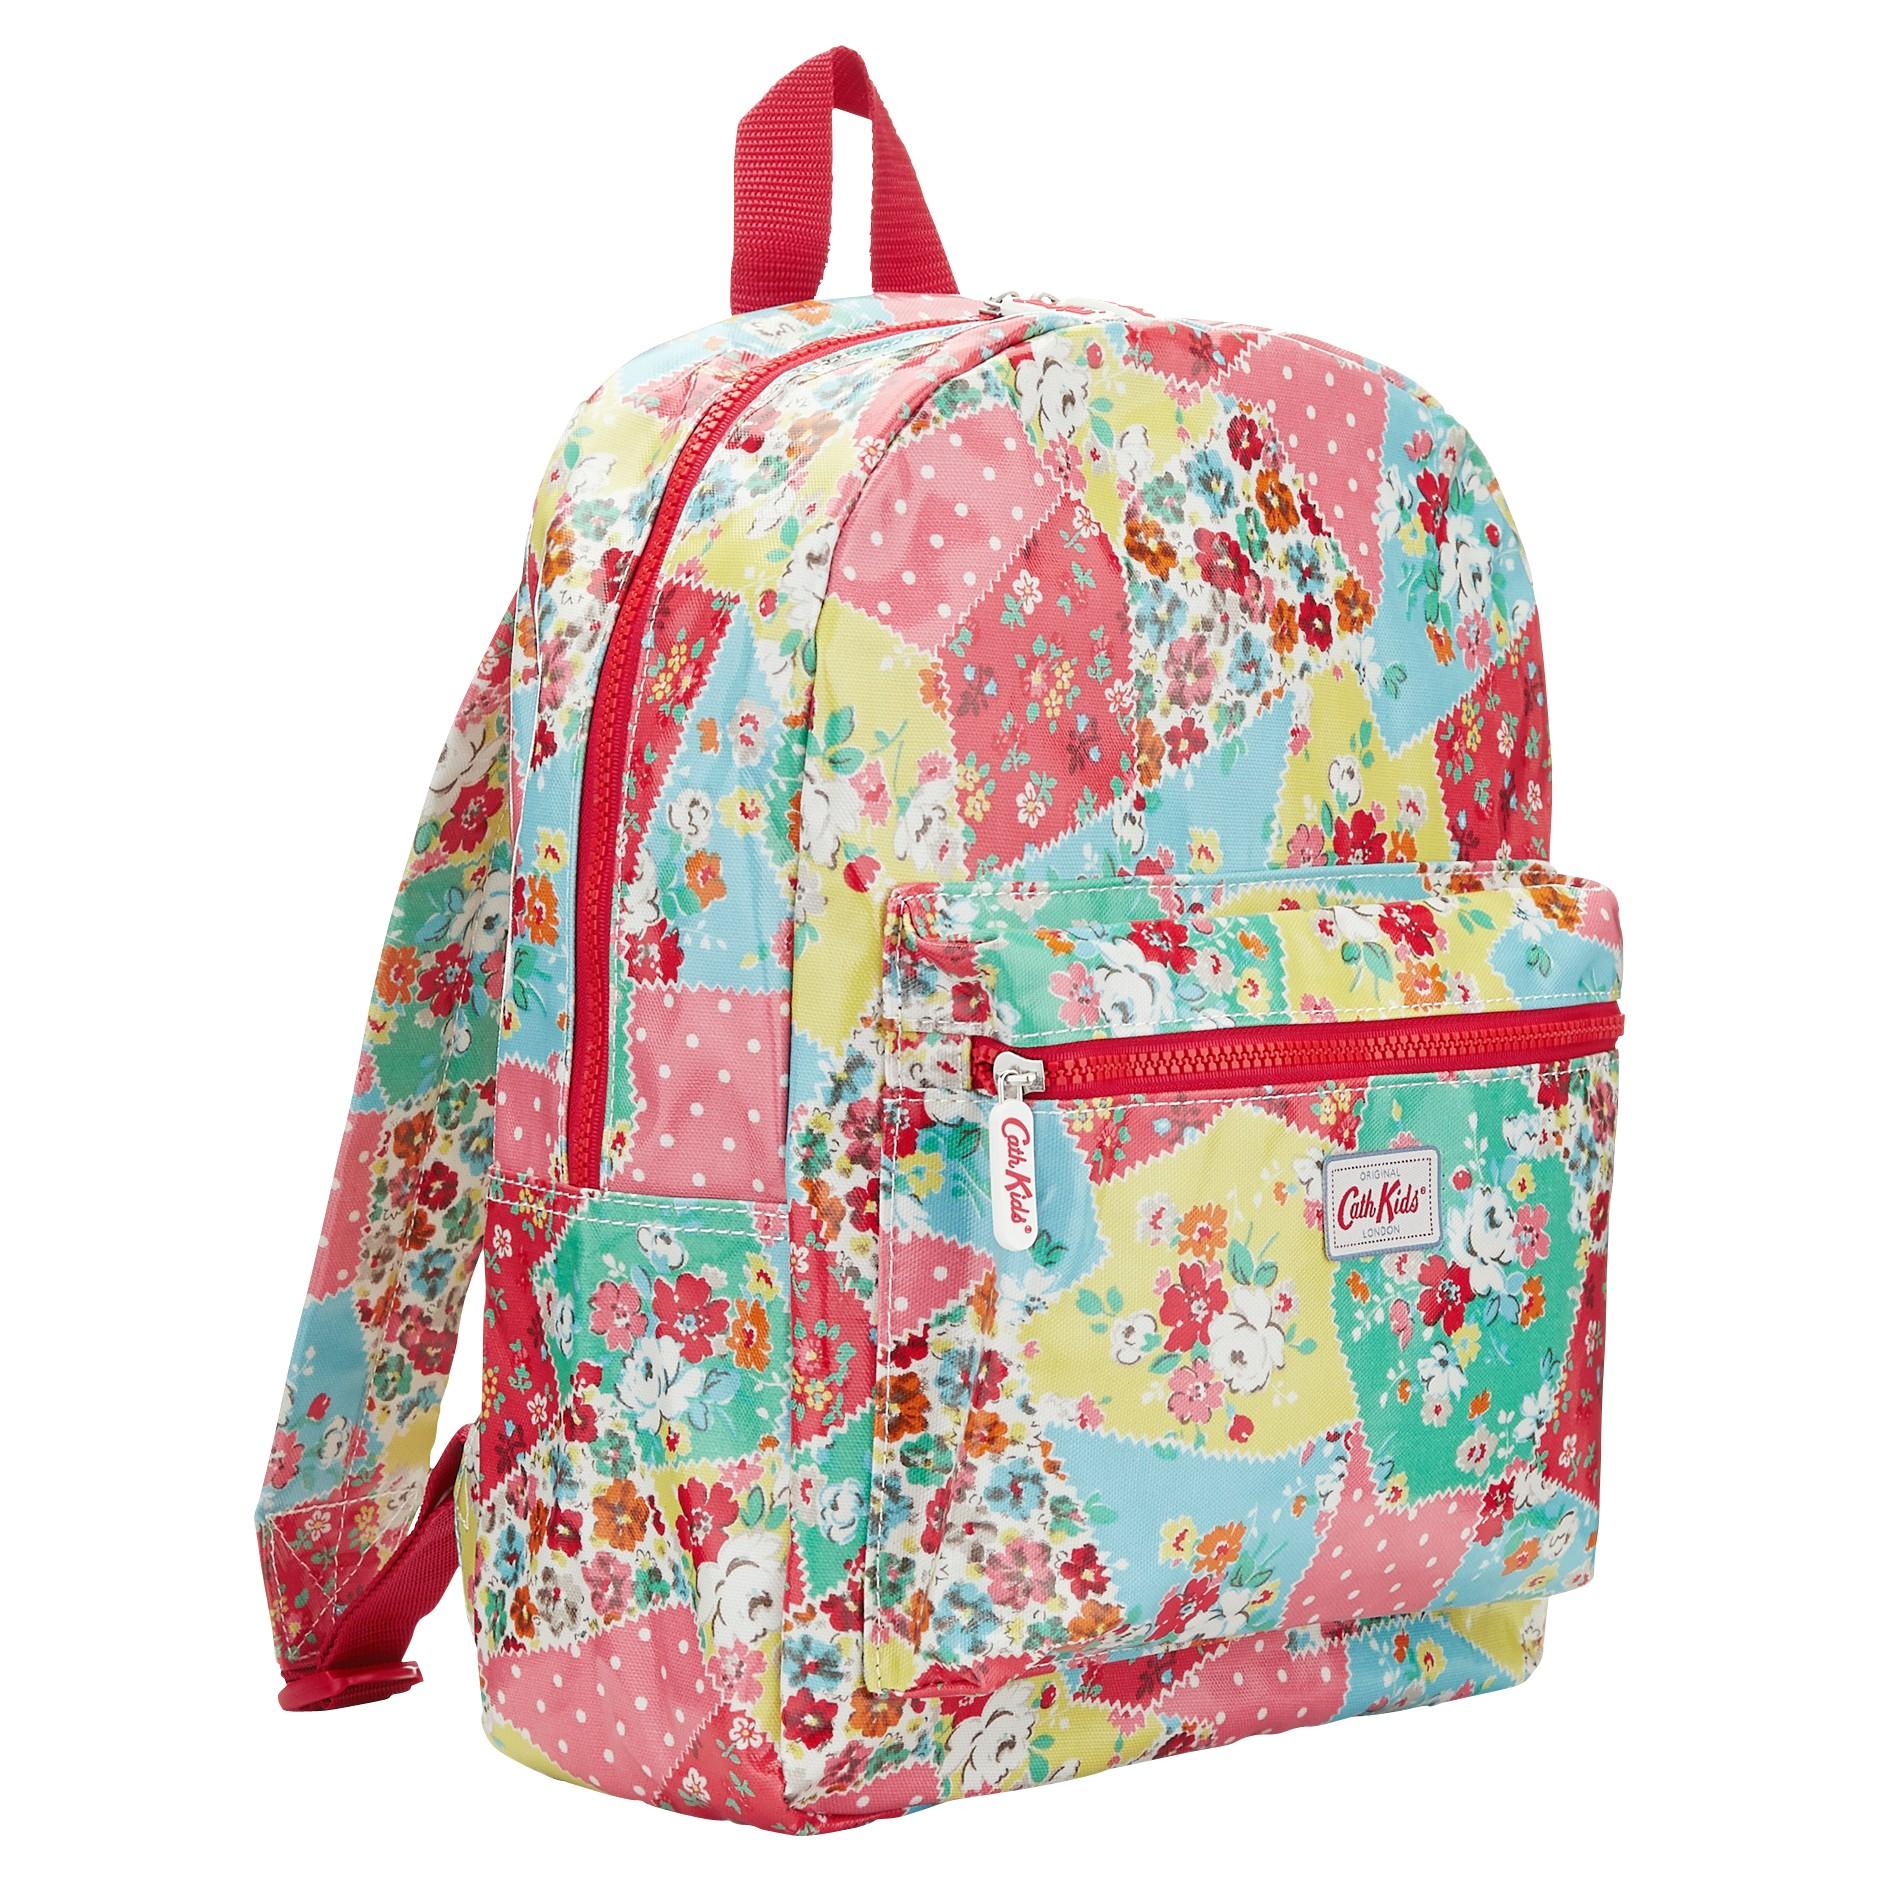 cath kidston patchwork padded backpack in multicolor. Black Bedroom Furniture Sets. Home Design Ideas